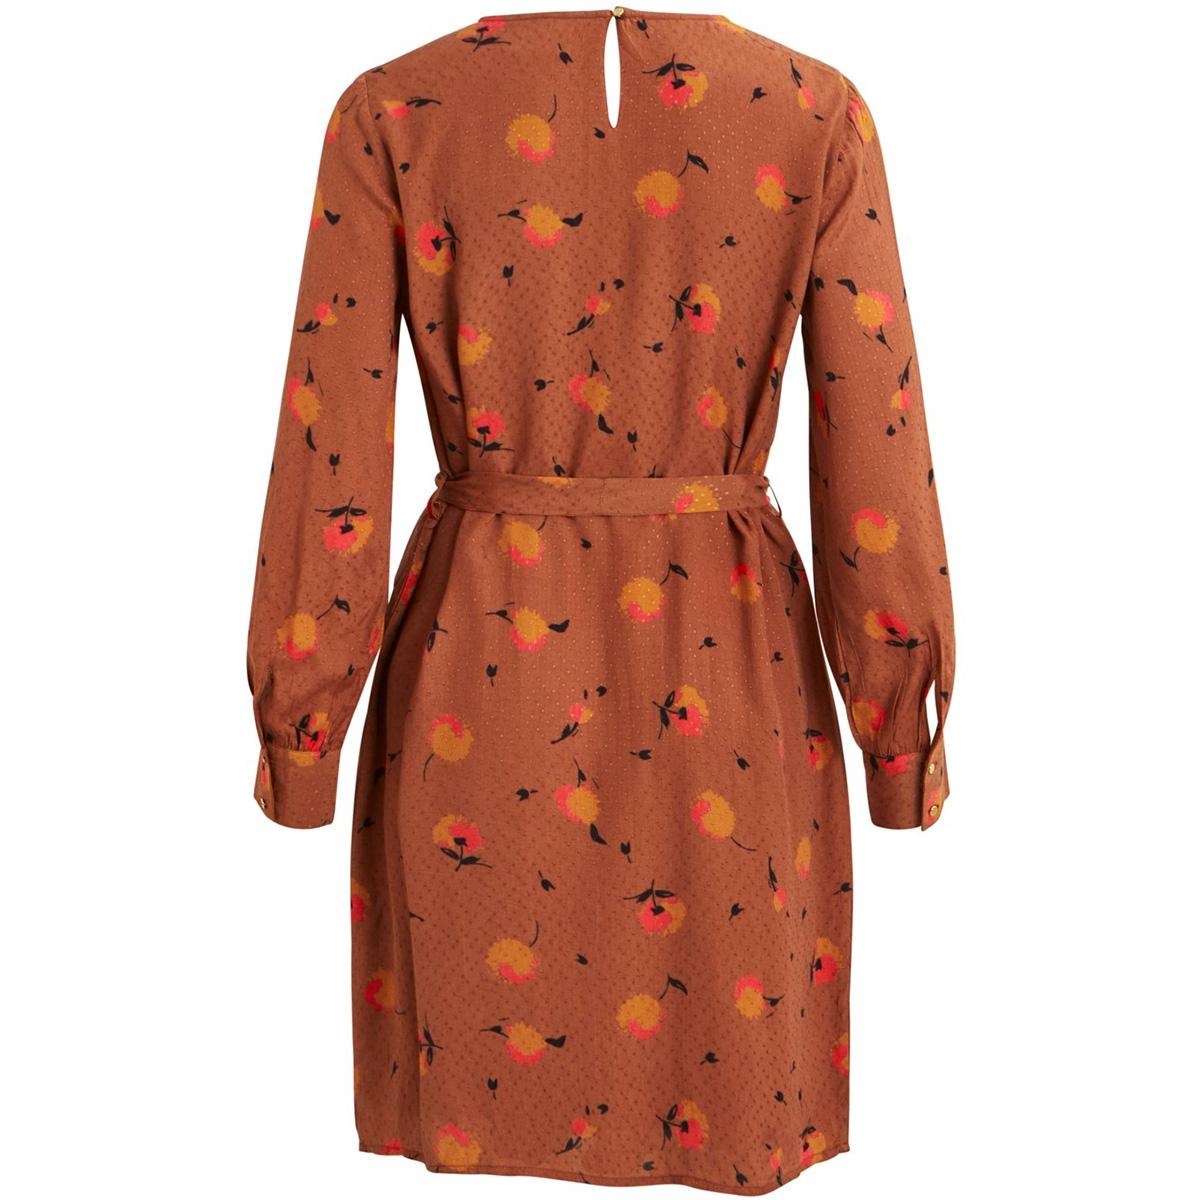 objsoyan rory l/s dress 106 23031119 object jurk brown patina/aop